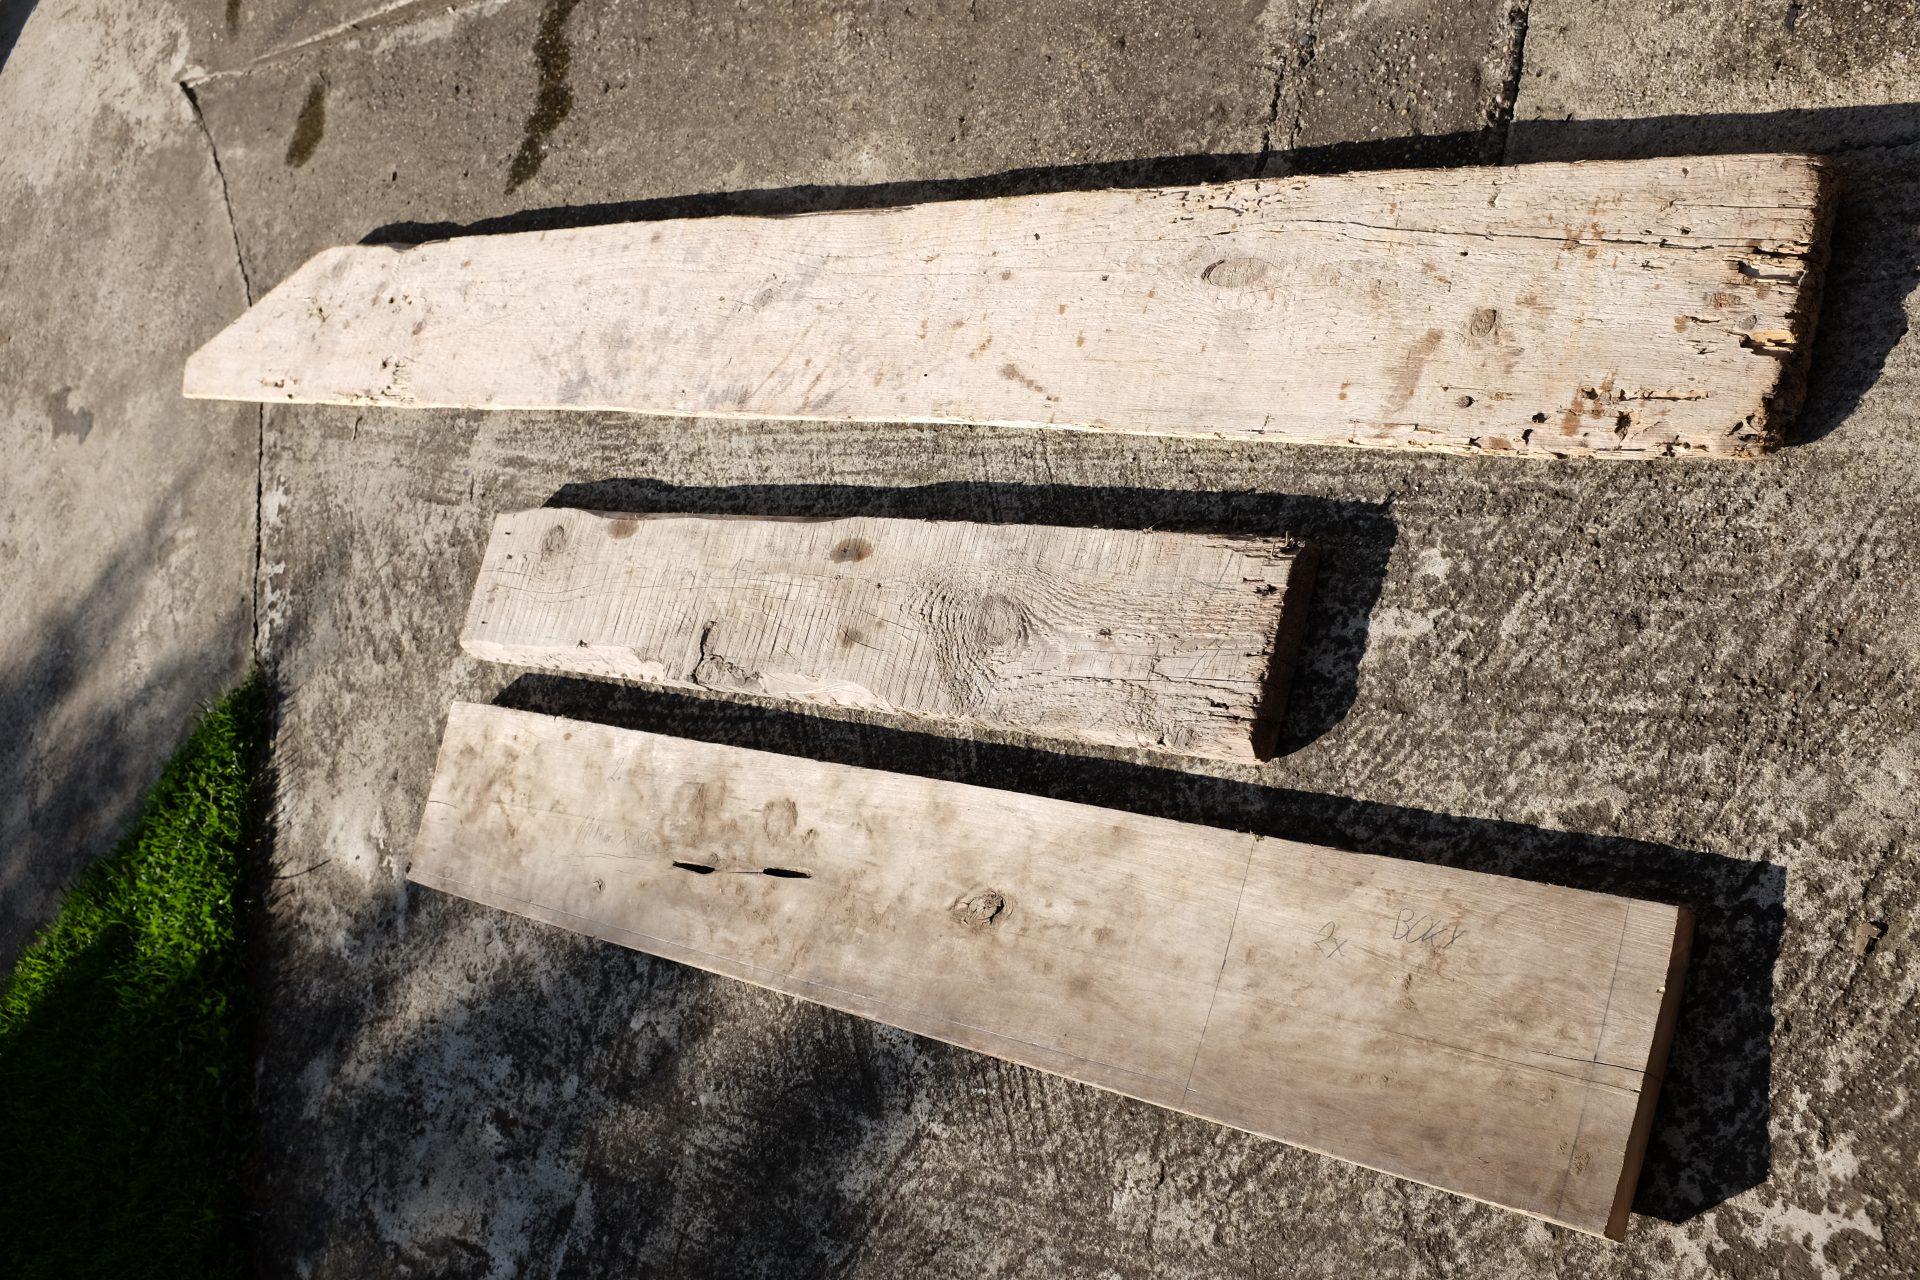 stare-drevene-dosky-diery-narusene-drevo-chodnik